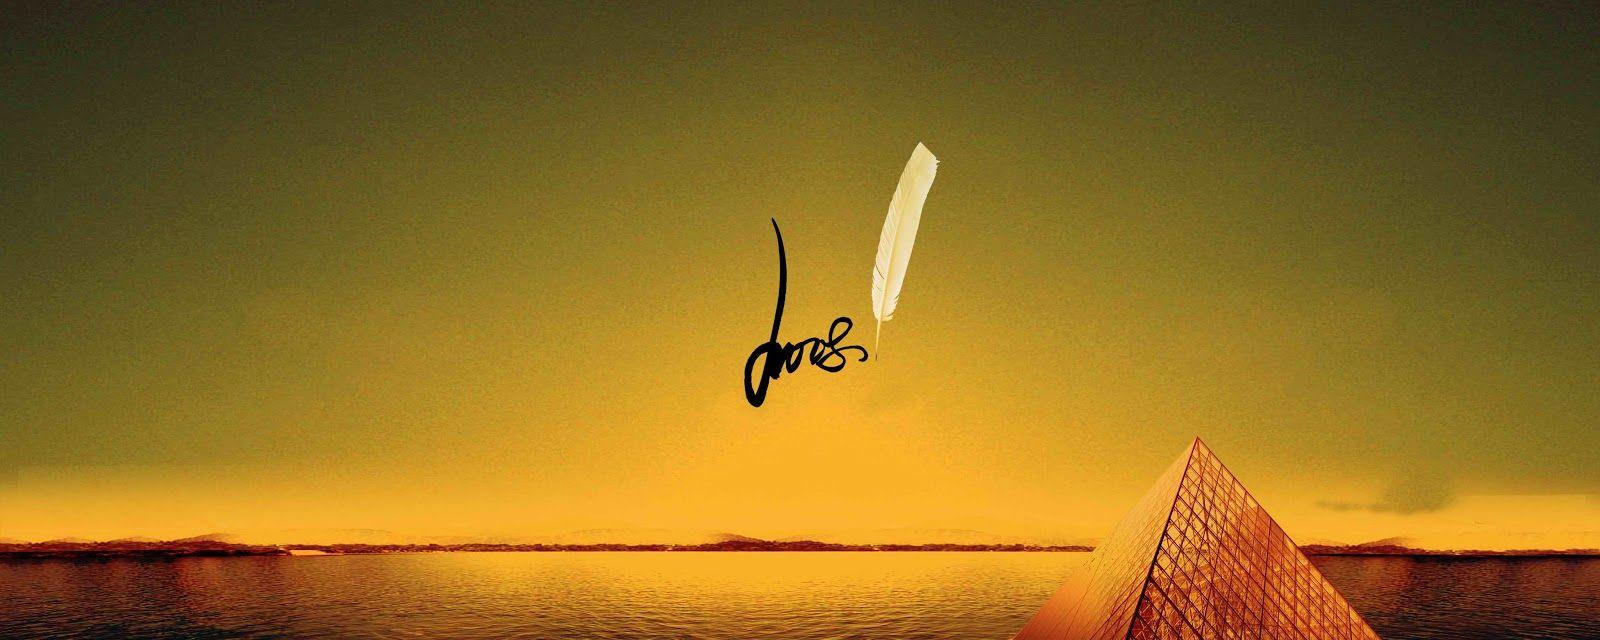 Karizma Album Background PSD Files Free Download 12x36